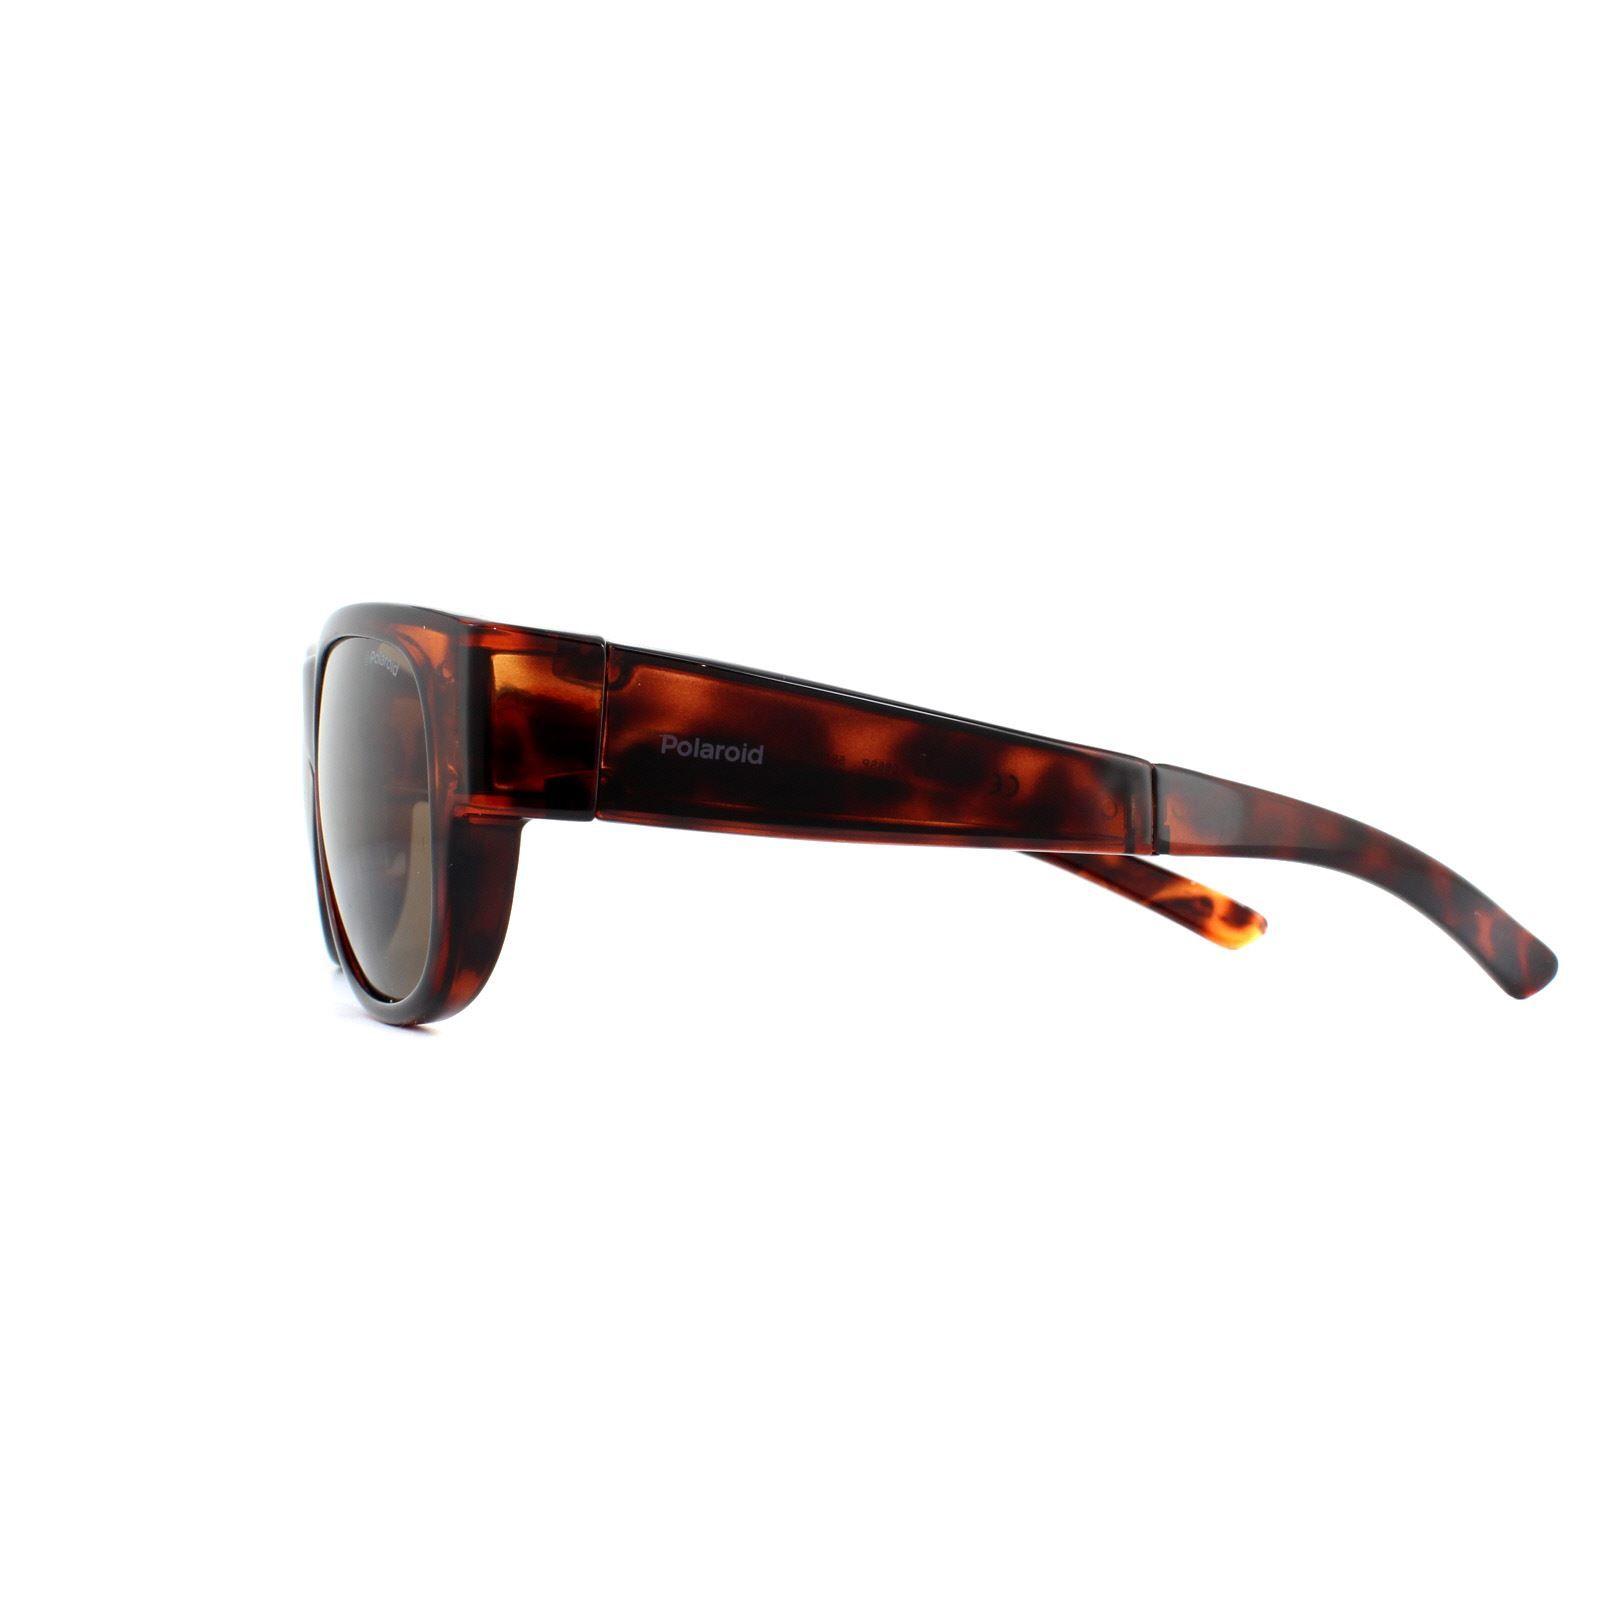 Polaroid Suncovers Fitover Sunglasses PLD 9008/S 086 SP Dark Havana Bronze Polarized